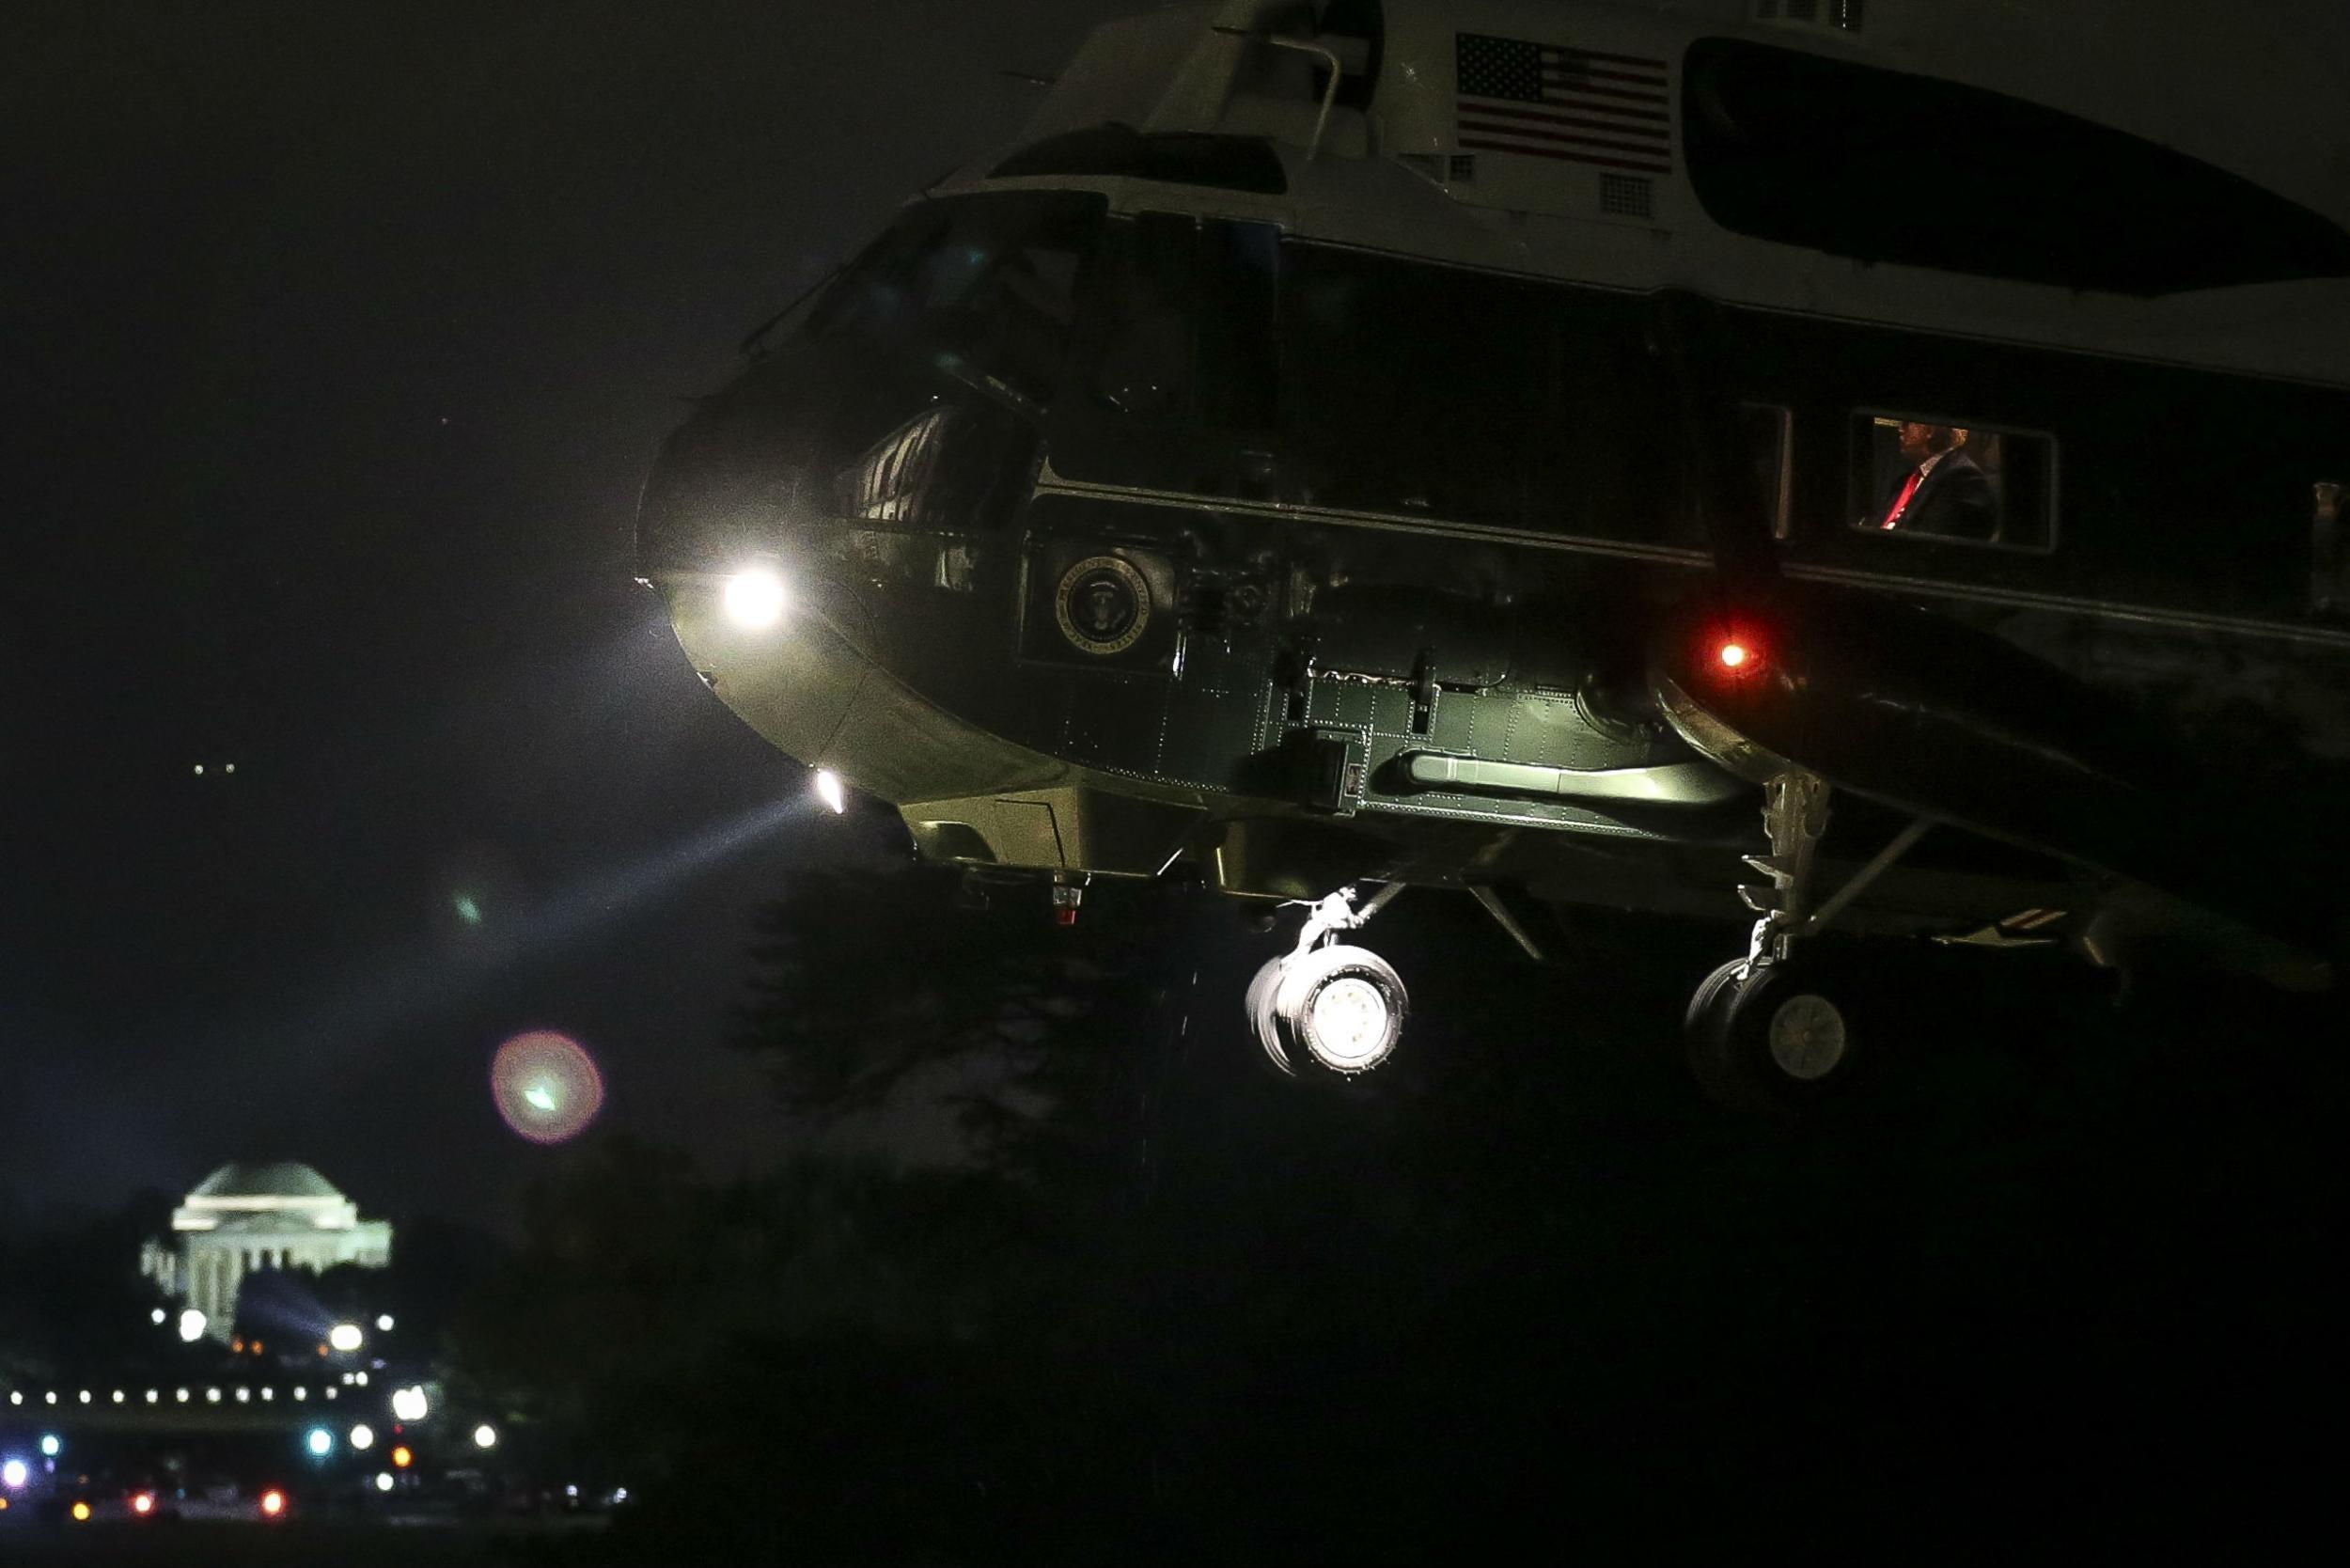 Trump says Putin summit was 'even better' than Nato meetings